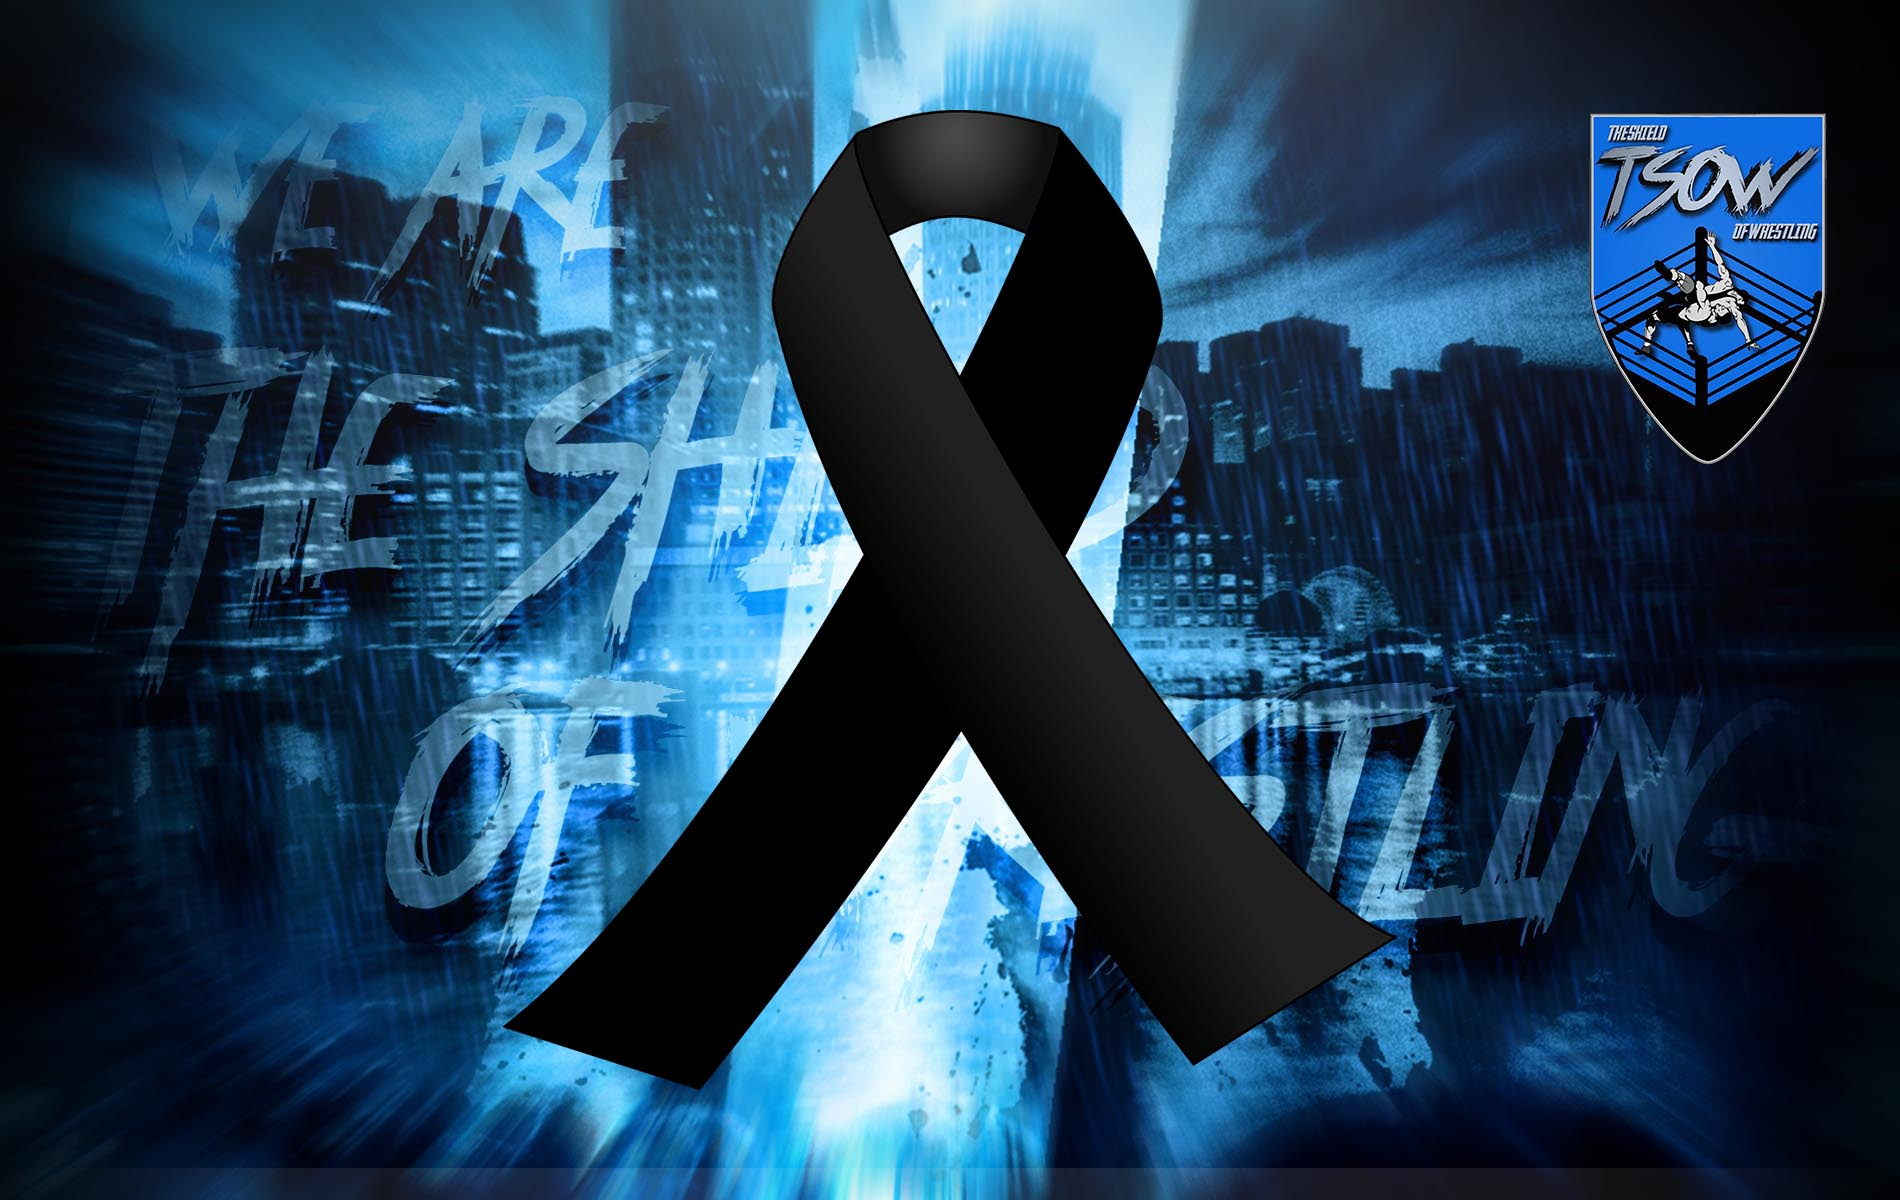 Pasión Kristal è scomparso a 45 anni